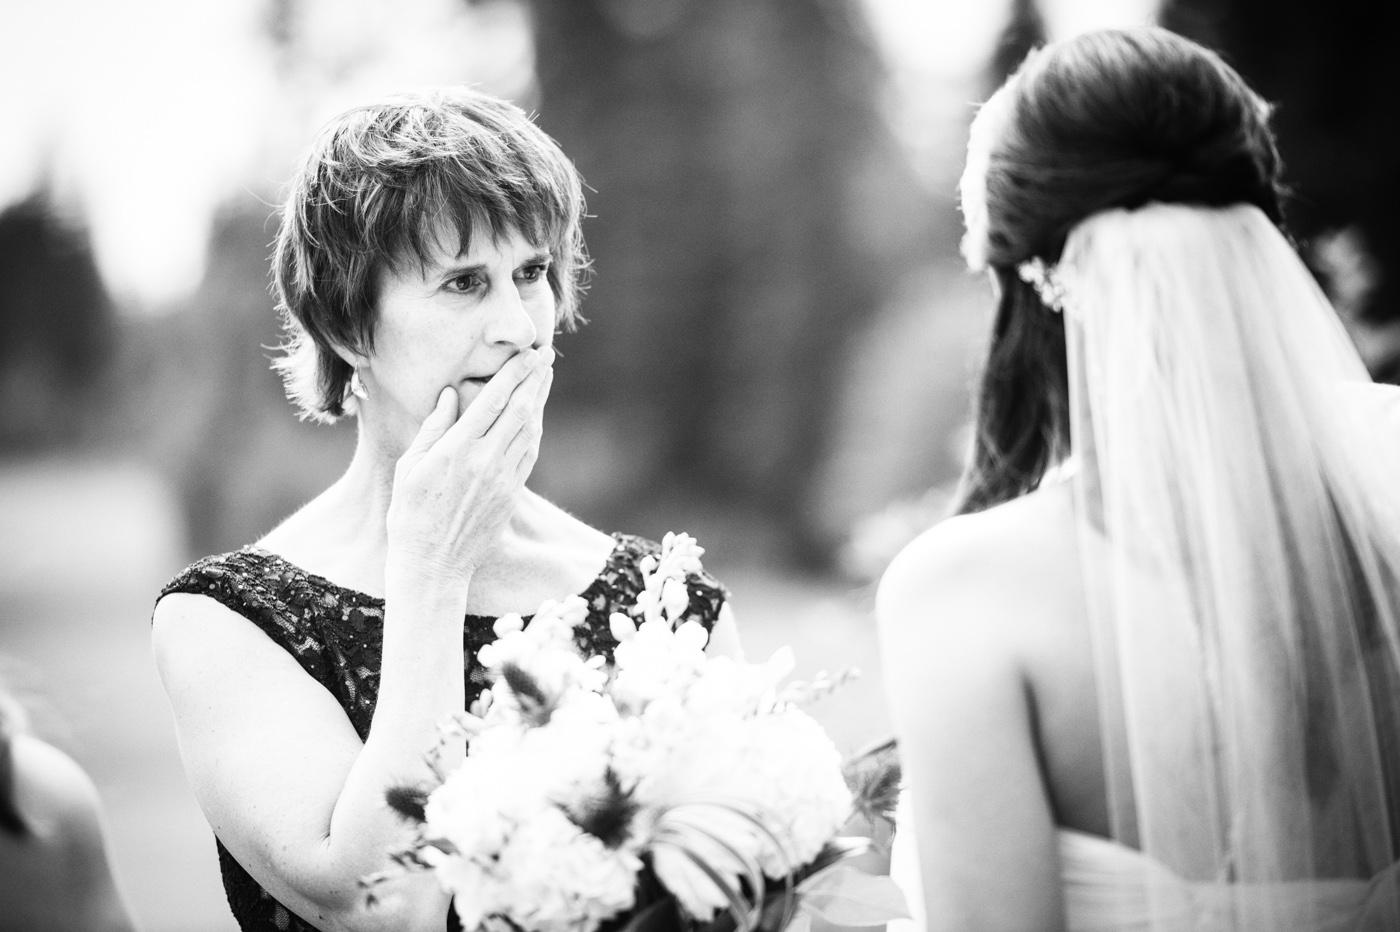 ss_weddingbest-16.jpg